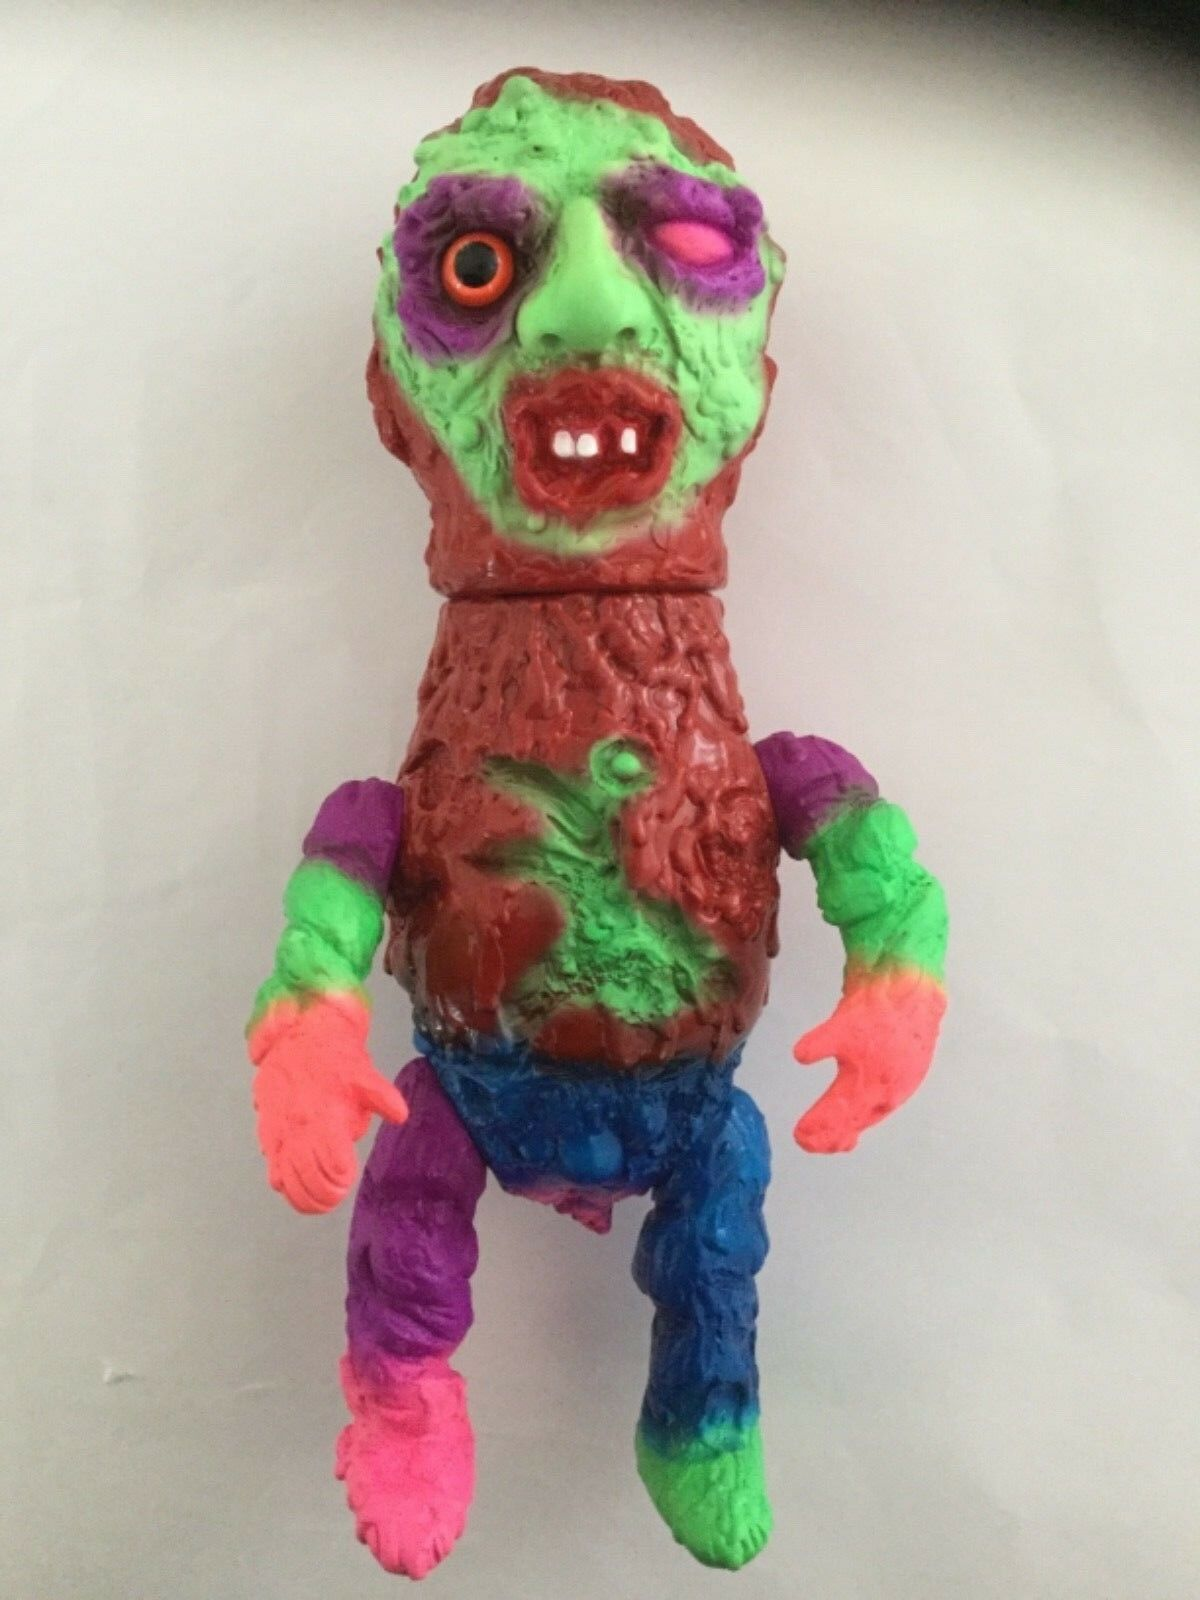 Blood  guts giocattoli shikabane Kaiju Izumo bgt Toxic eater Nag HXS mvh zollmen bemon  vendita online